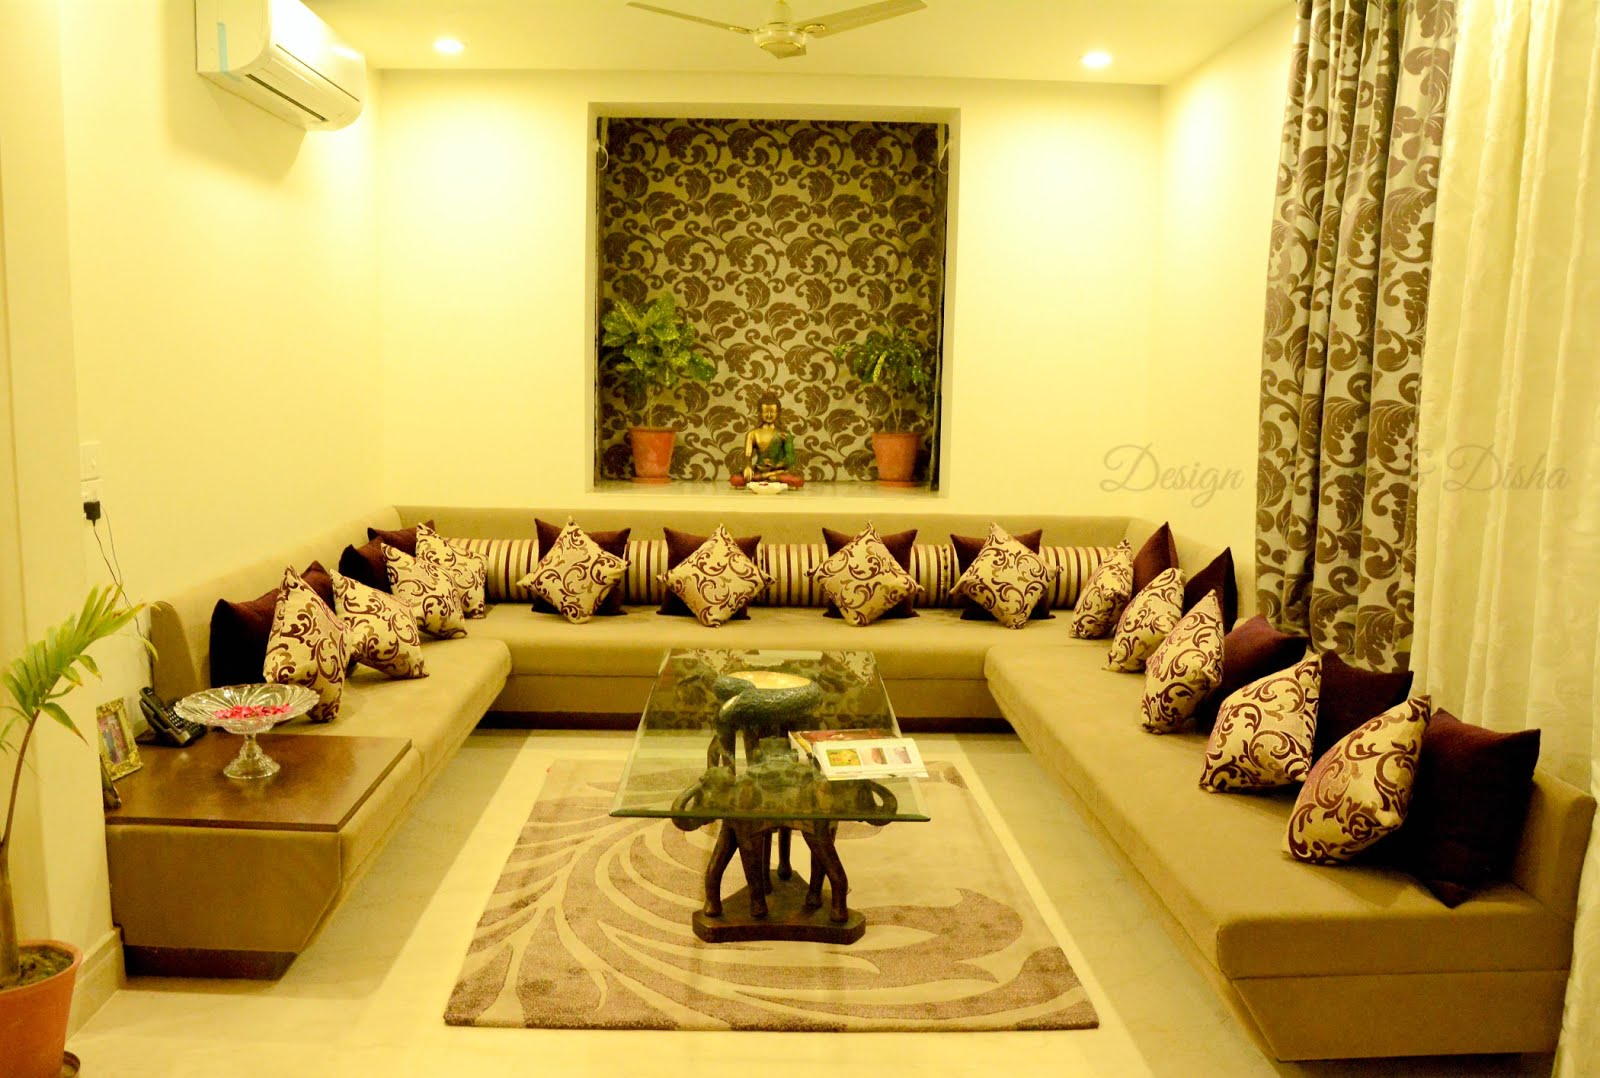 Design Decor & Disha | An Indian Design & Decor Blog